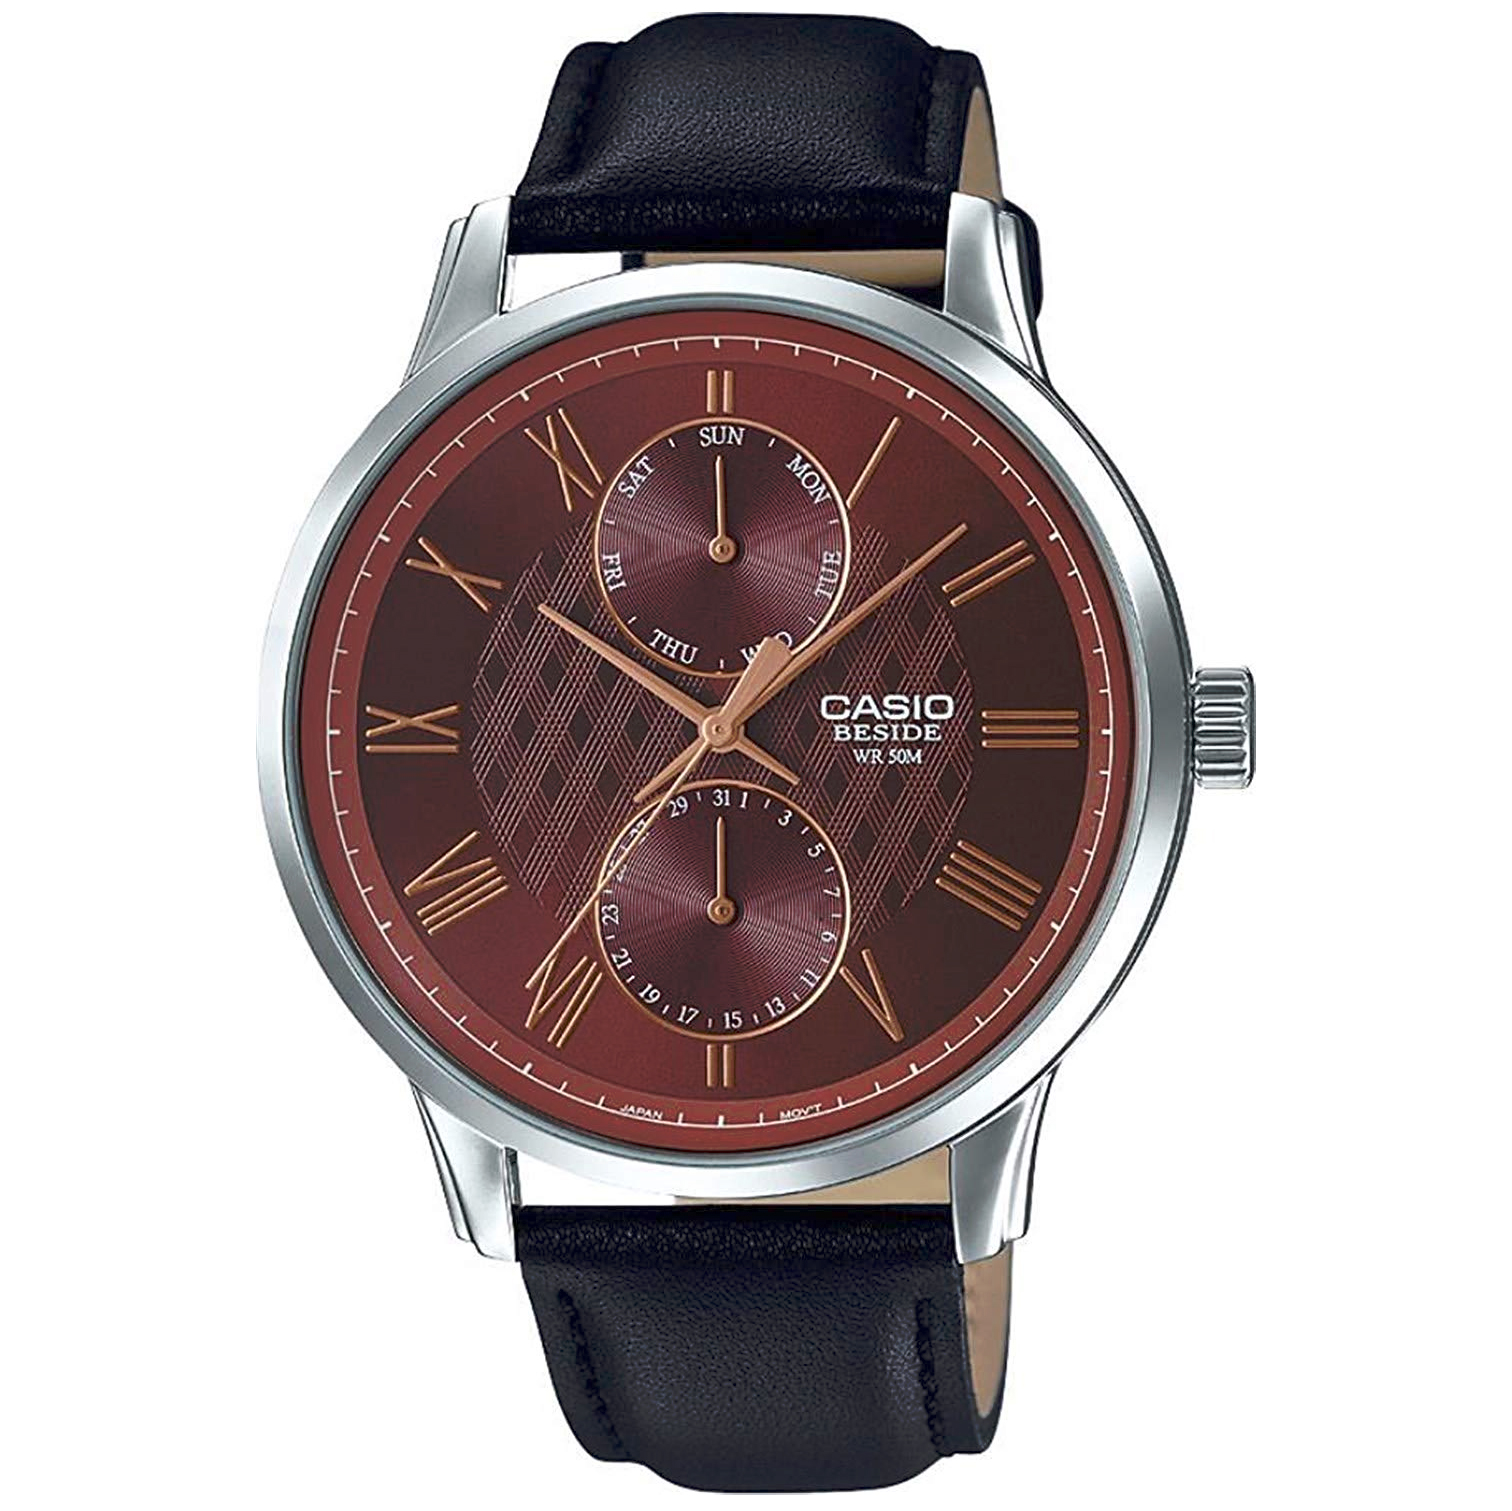 4cc5b2d08b96 Importacionesjgarcia.com   Reloj Casio Bem-313L-5Av Beside ...